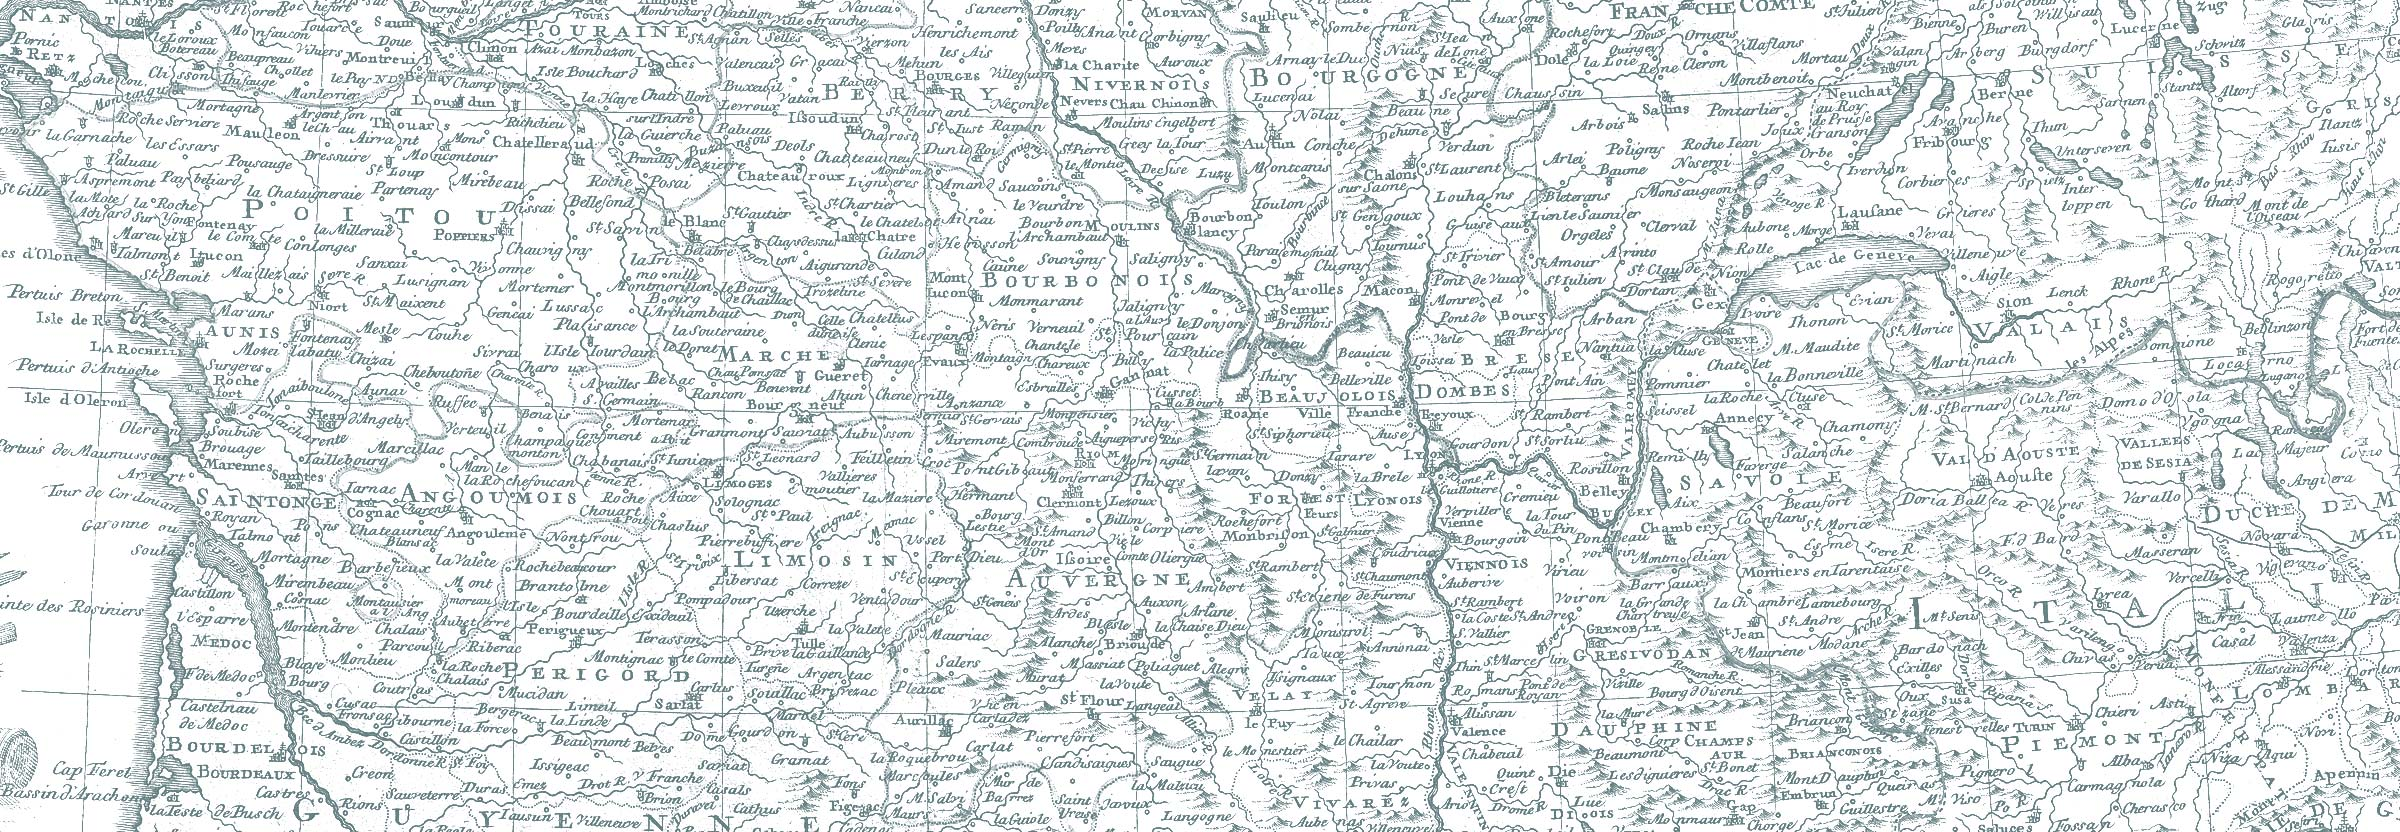 1741-map-france-parallax-2